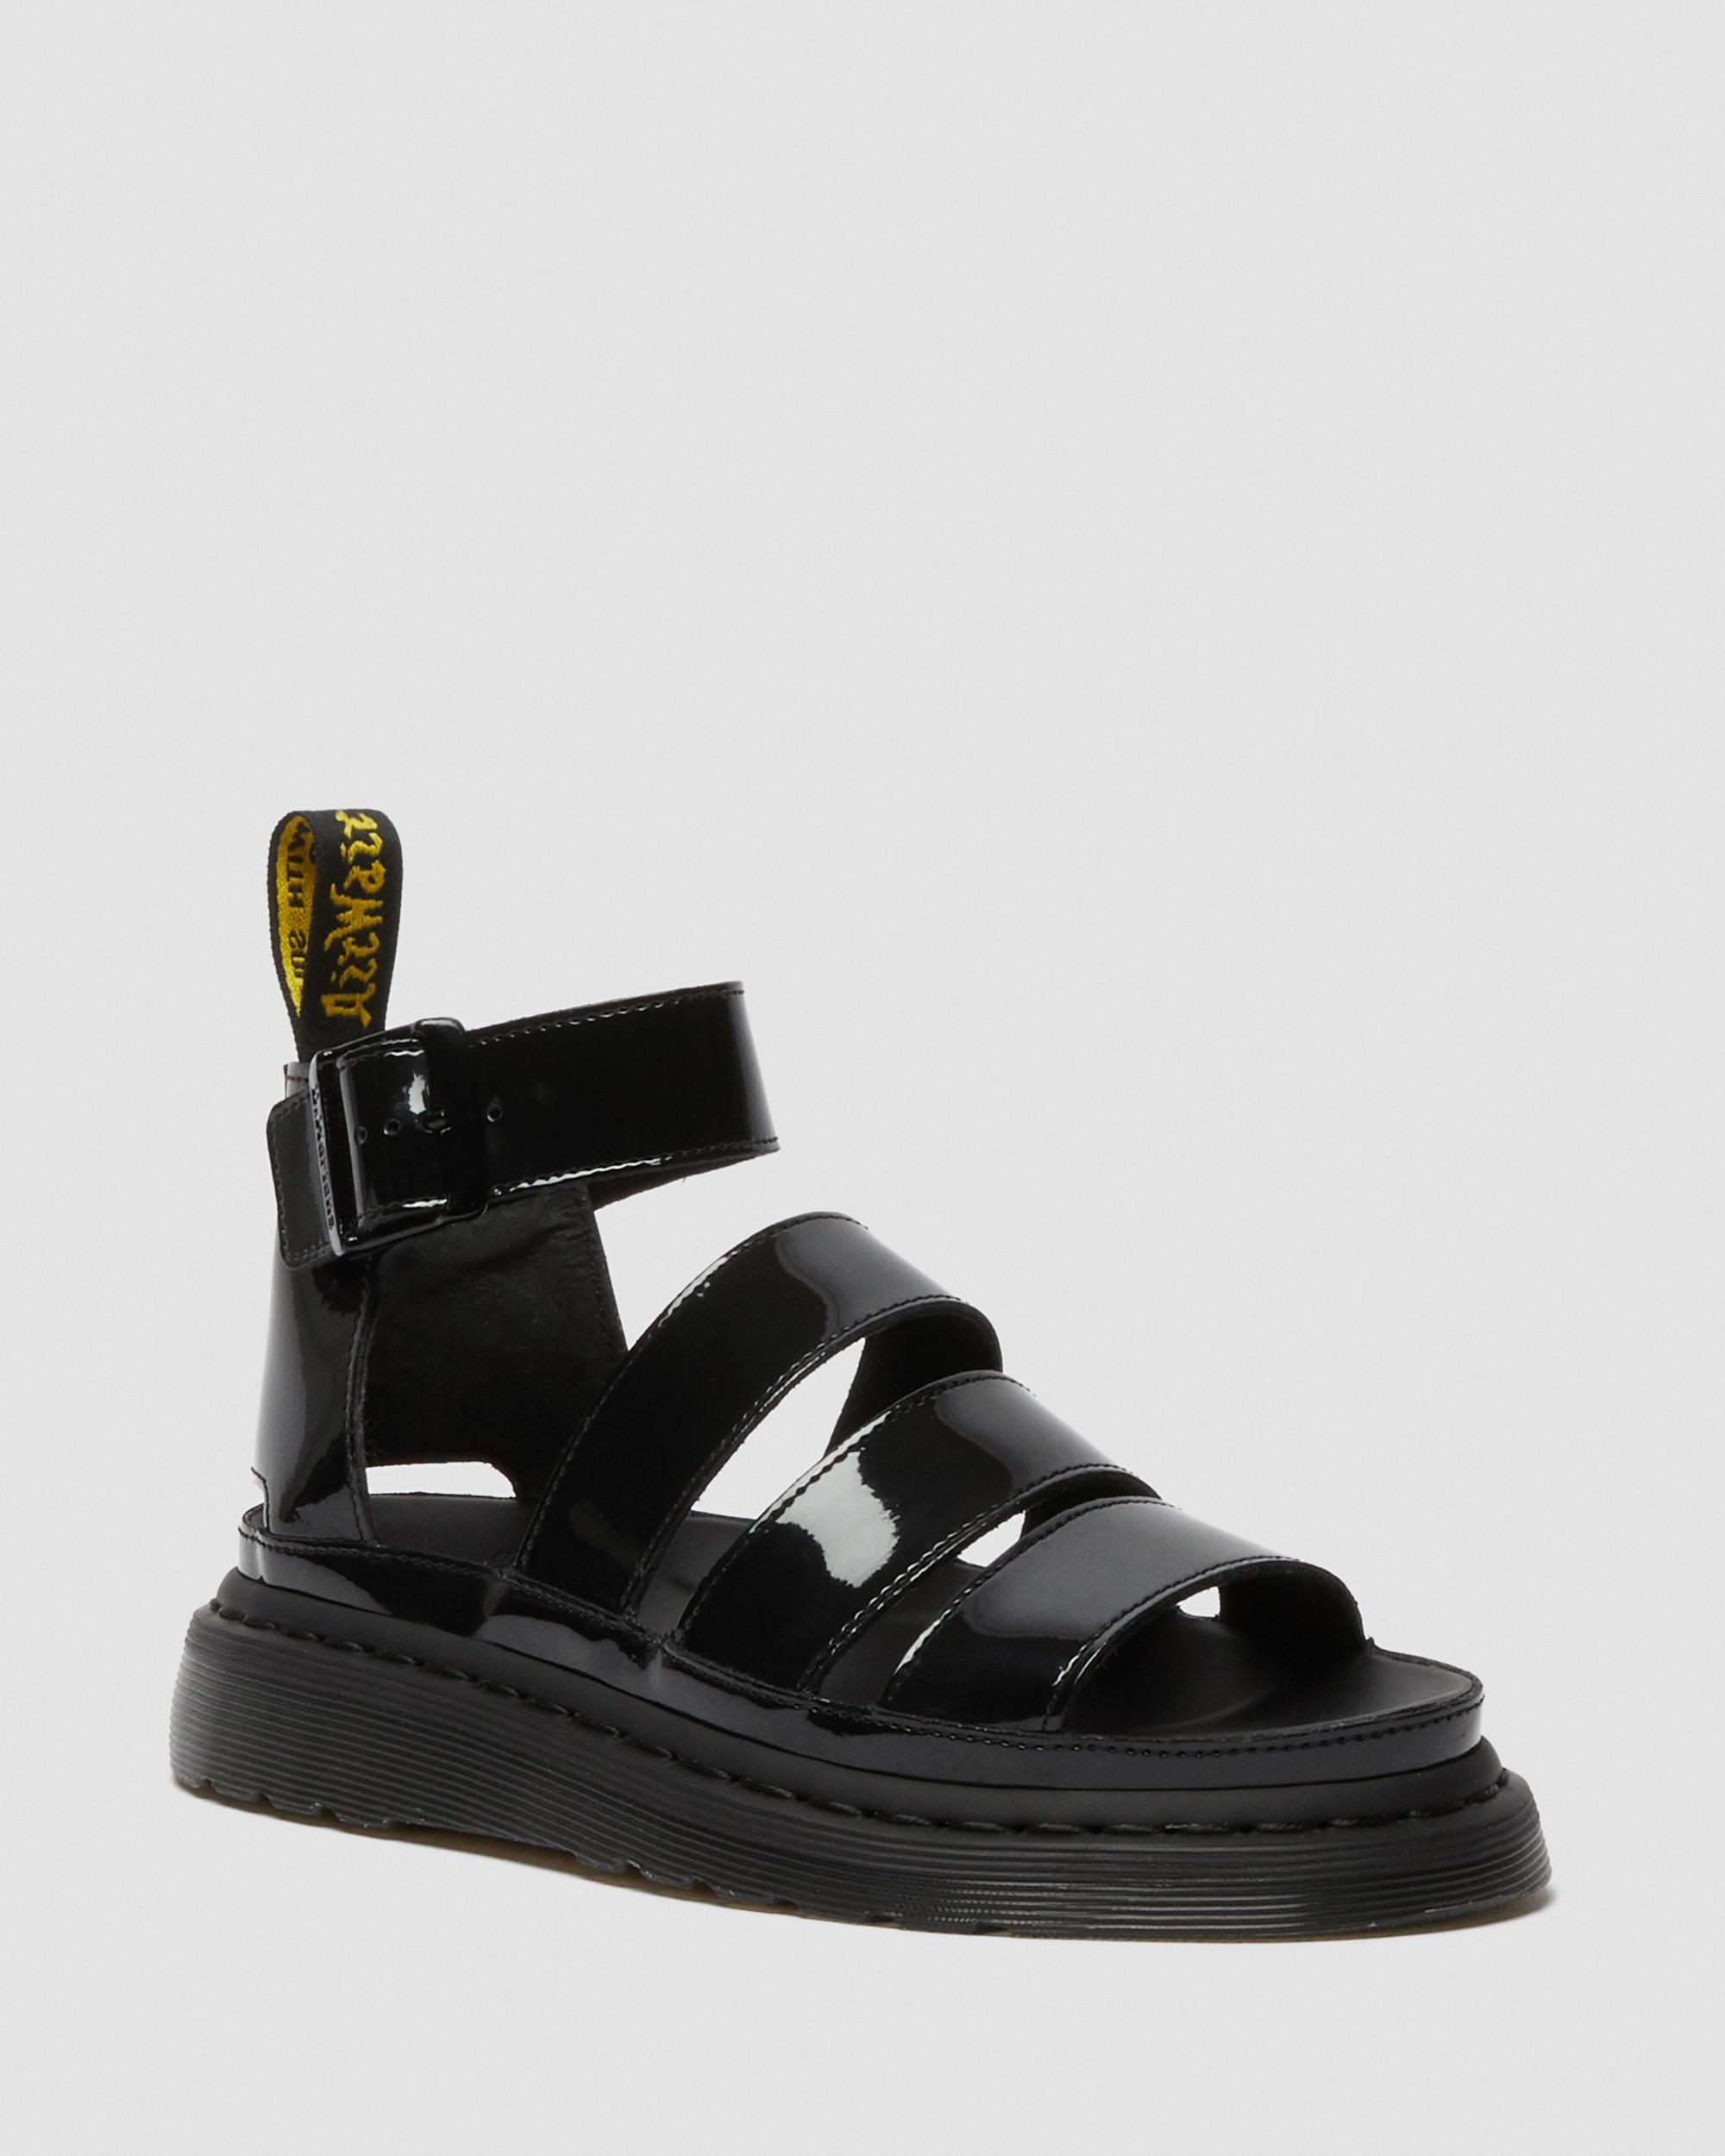 Dr. Martens Blaire Patent Lamper Sandal | Dr martens sandals